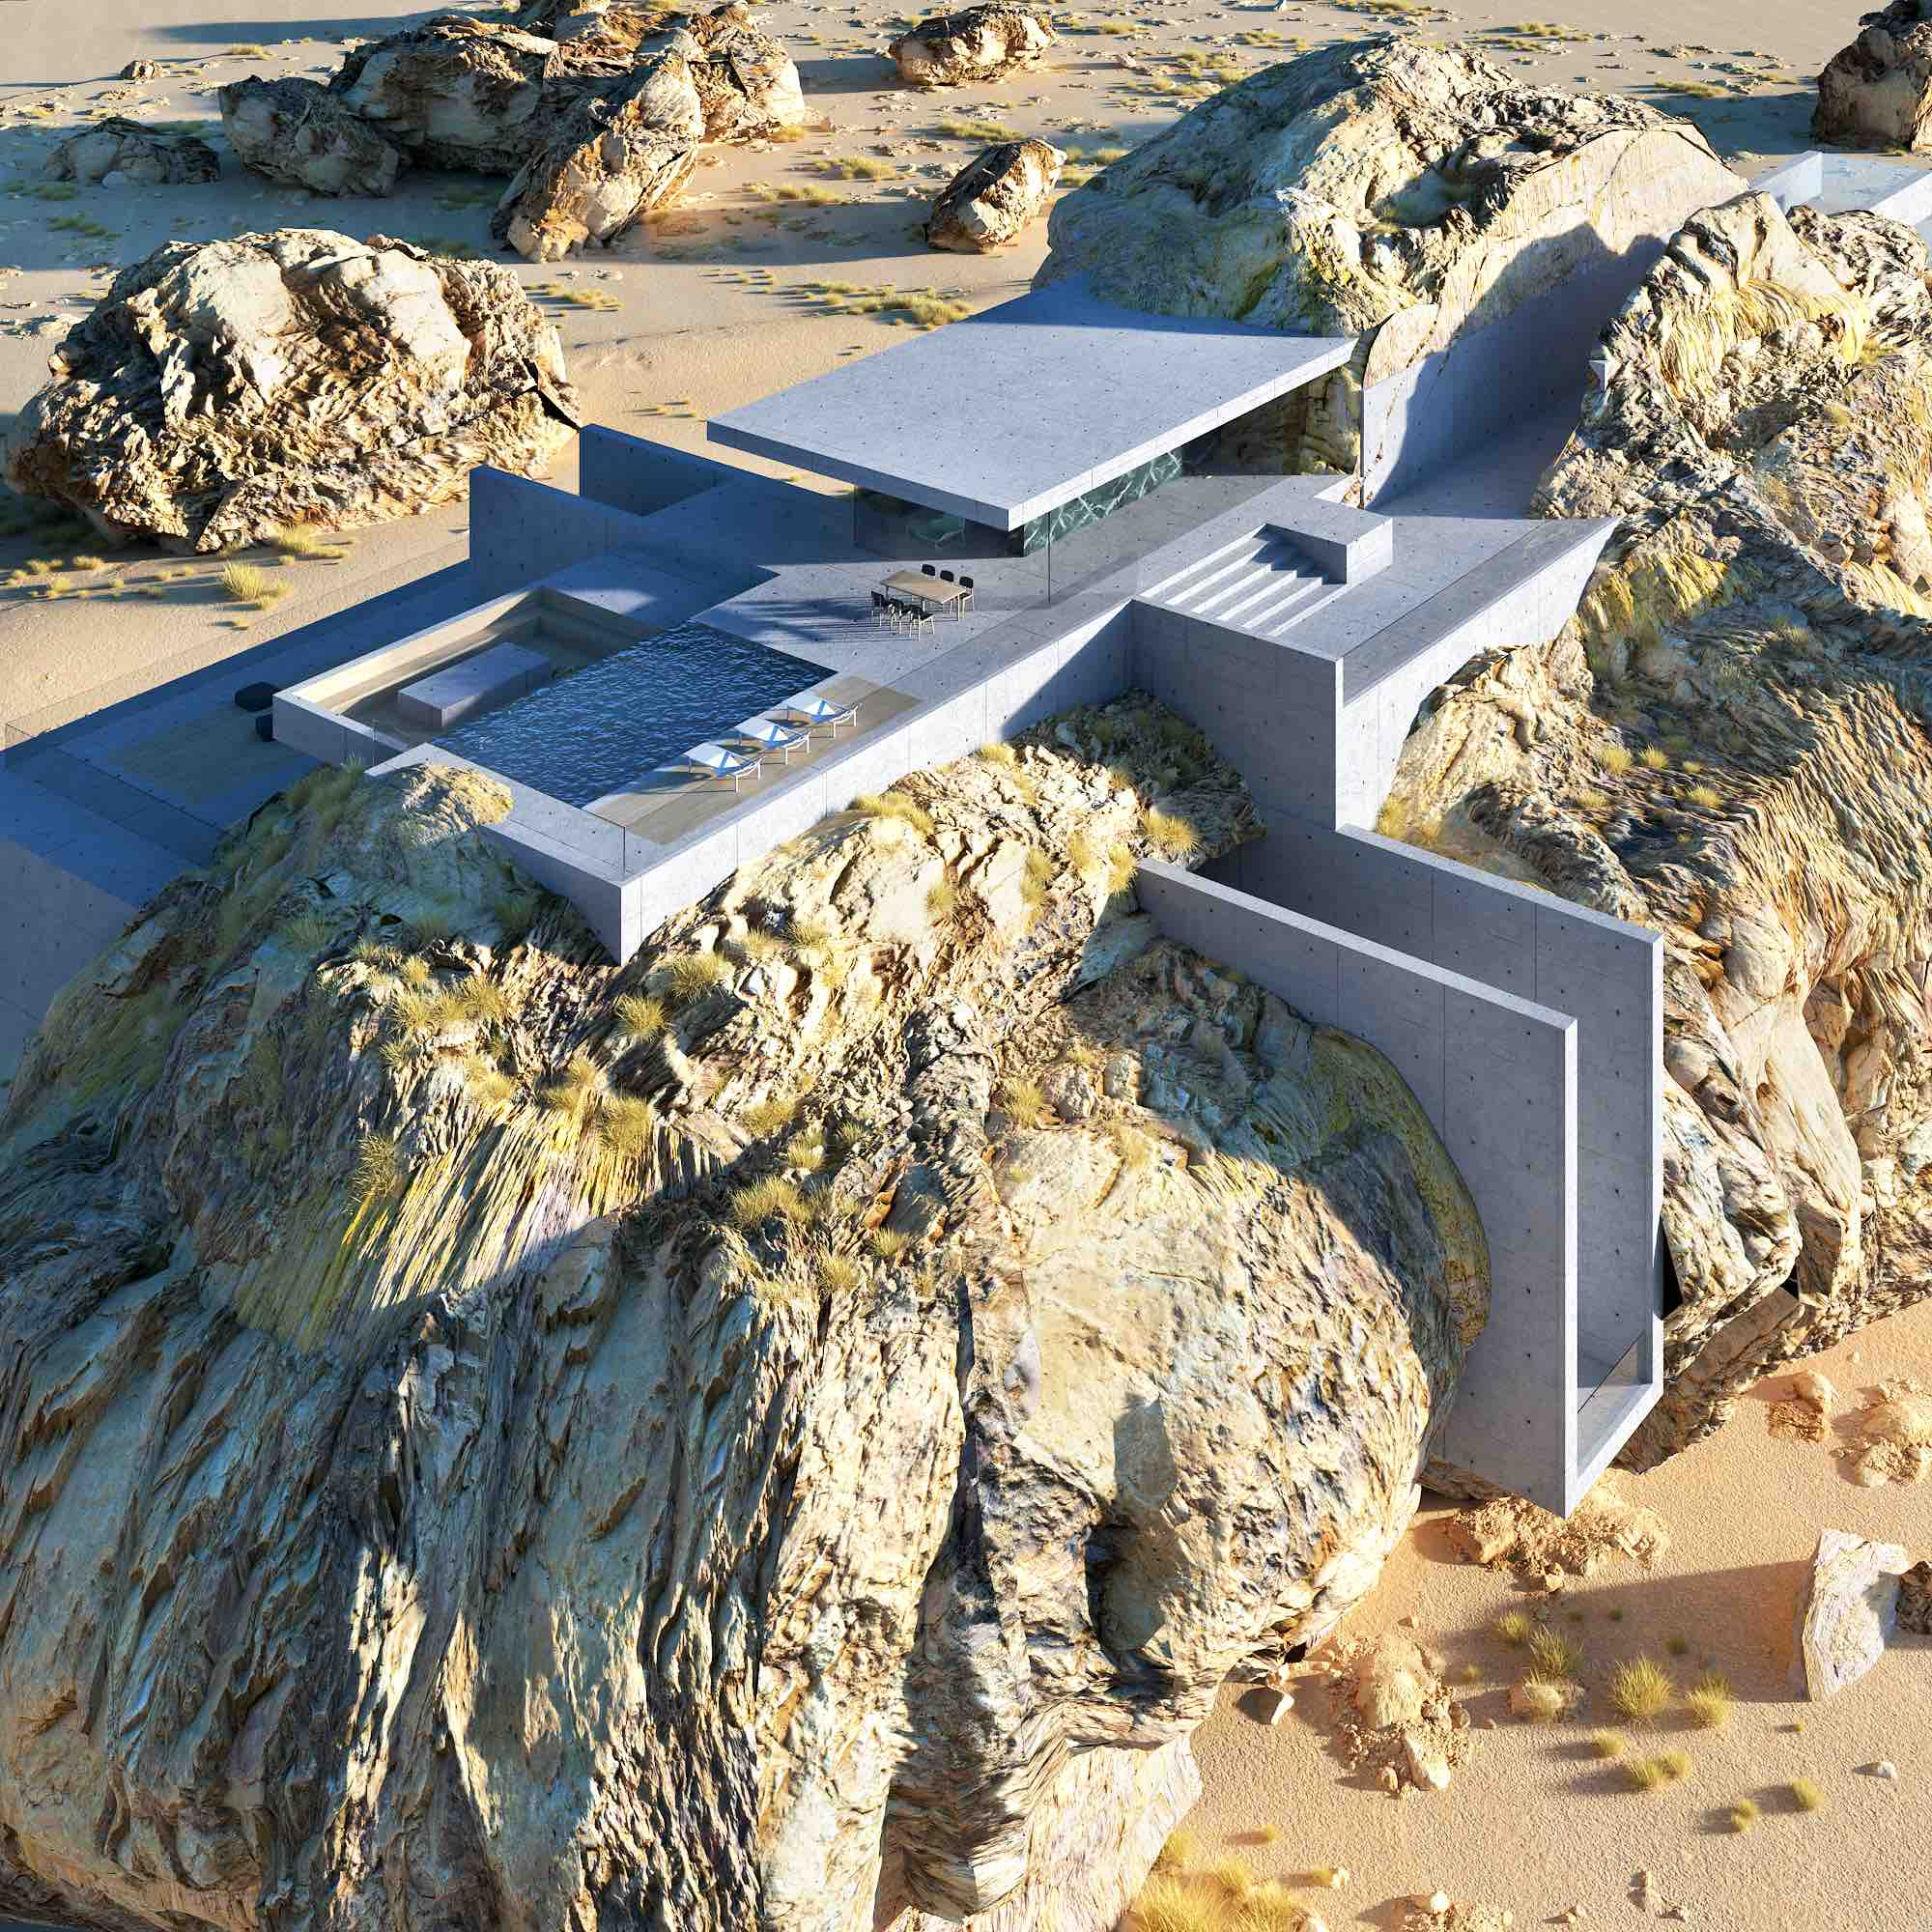 House-inside-a-rock-Amey-Kandalgaonkar-SaudiArabia-001.jpg